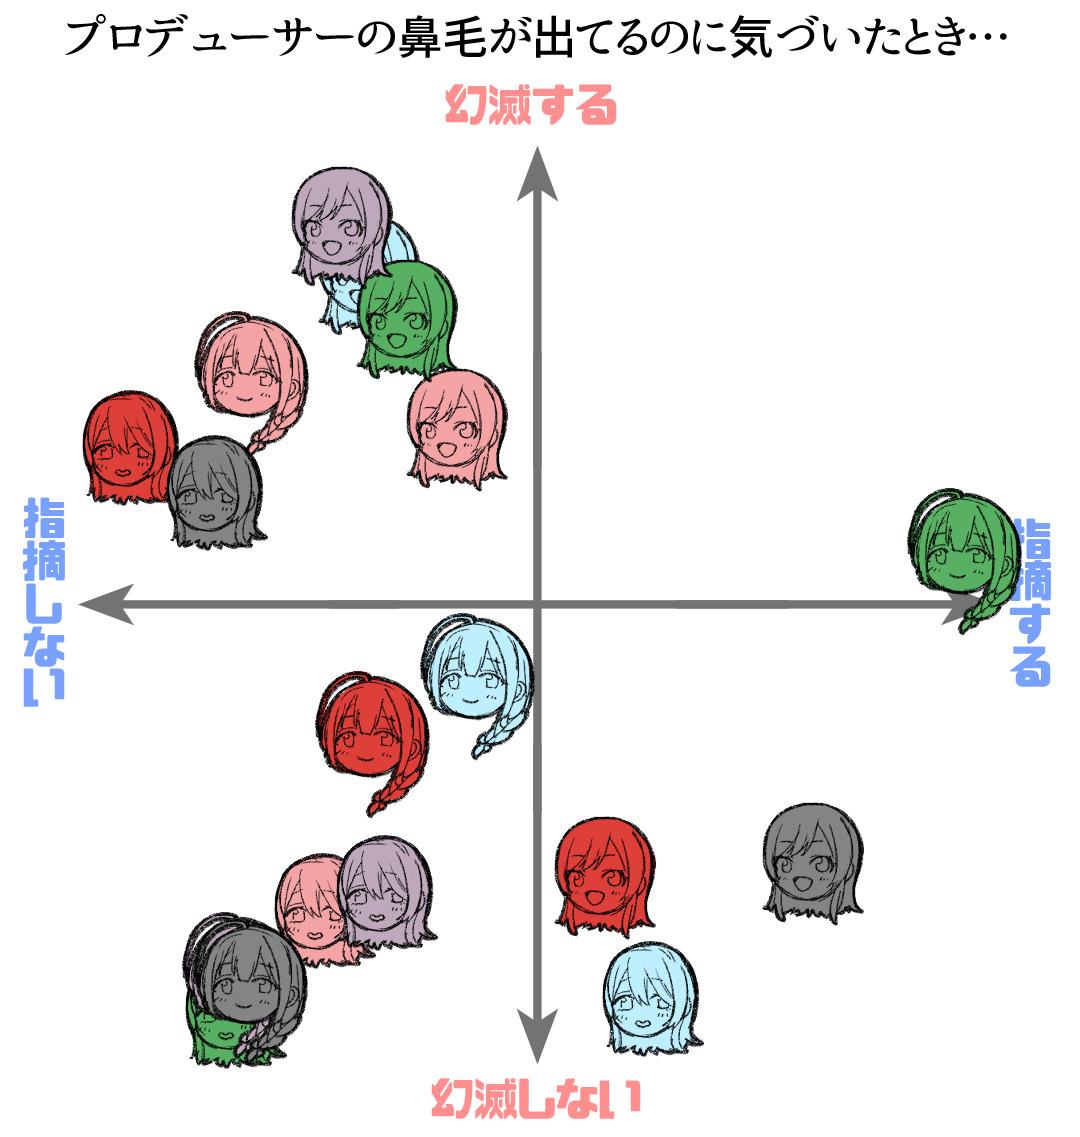 f:id:hoshi_sano:20200414113922j:image:w400